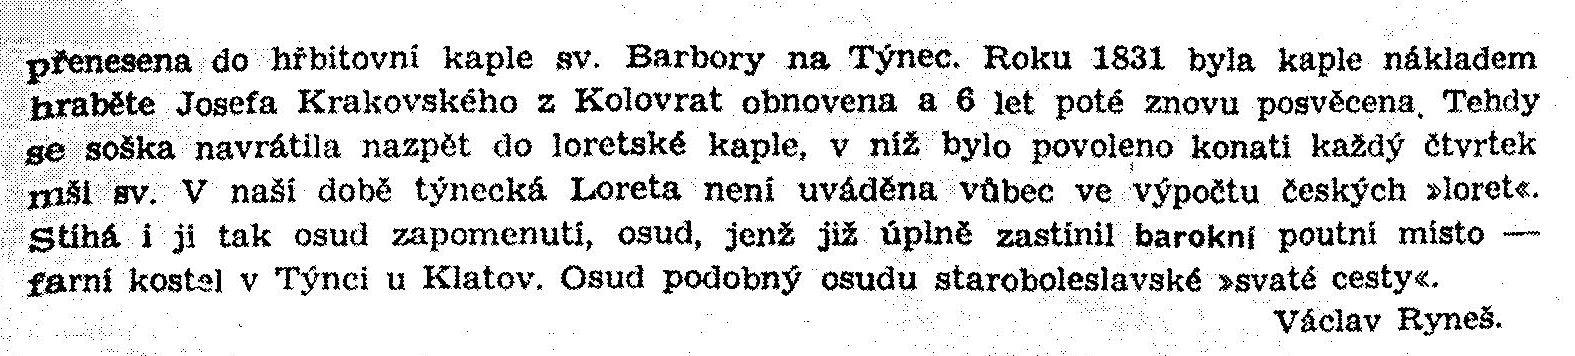 PM Týnecká 03